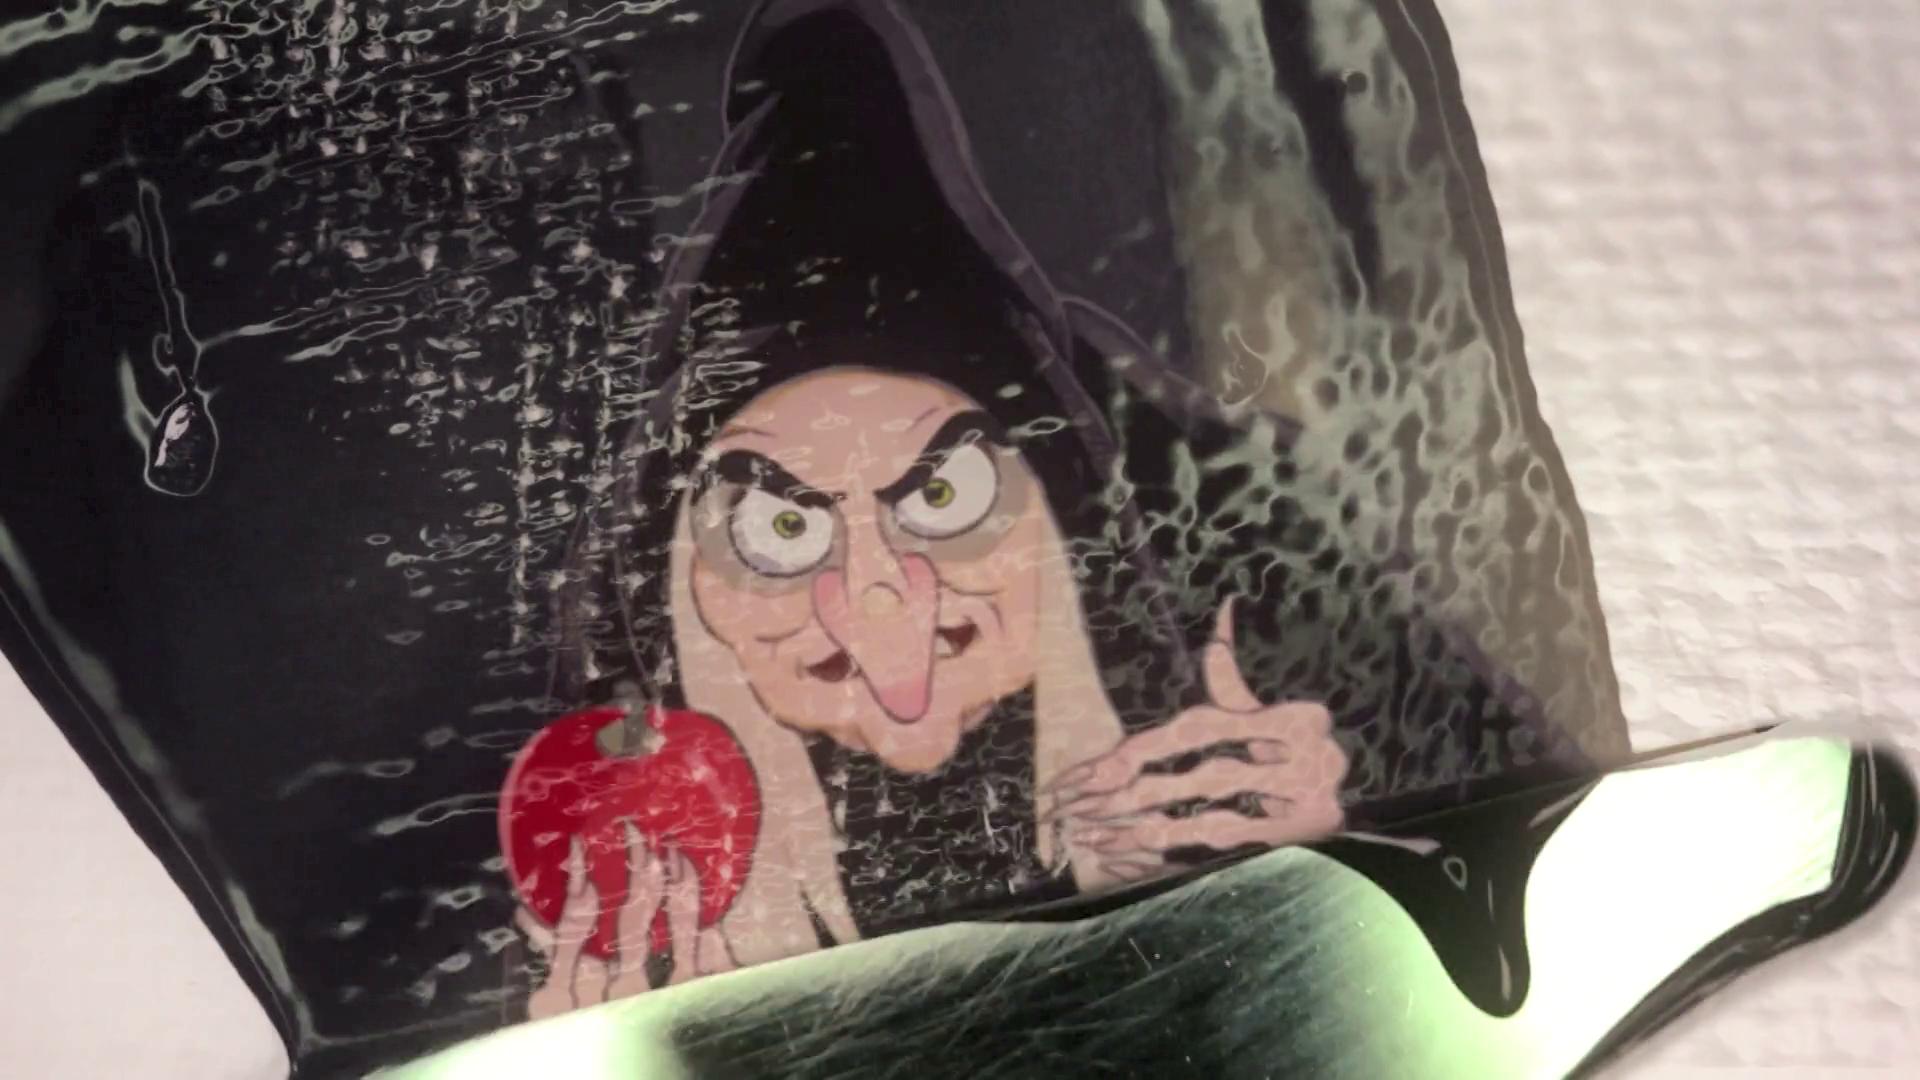 Snow White and the Seven Dwarfs Trailer